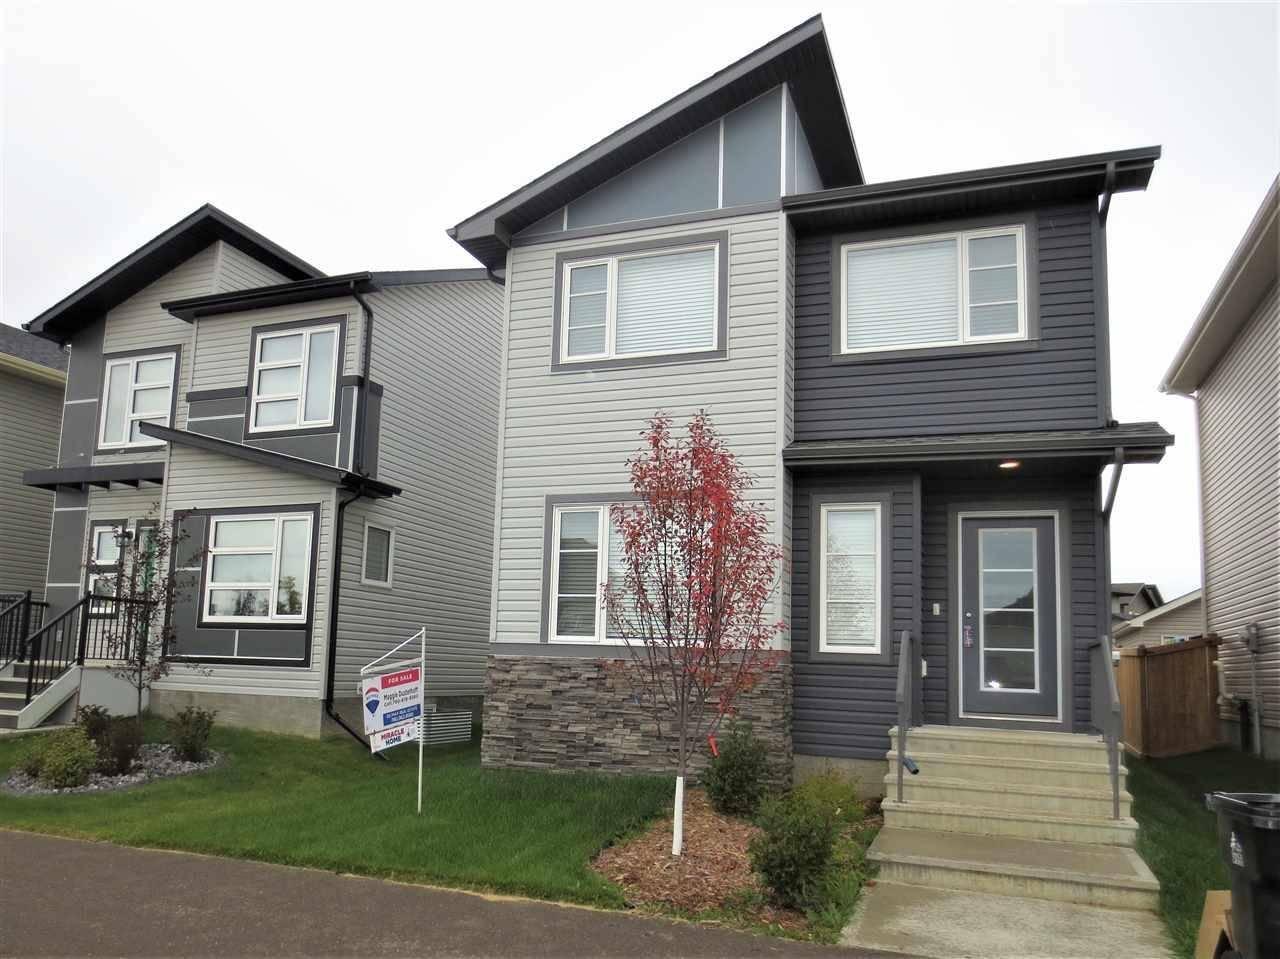 House for sale at 104 Harvest Ridge Dr Spruce Grove Alberta - MLS: E4174131